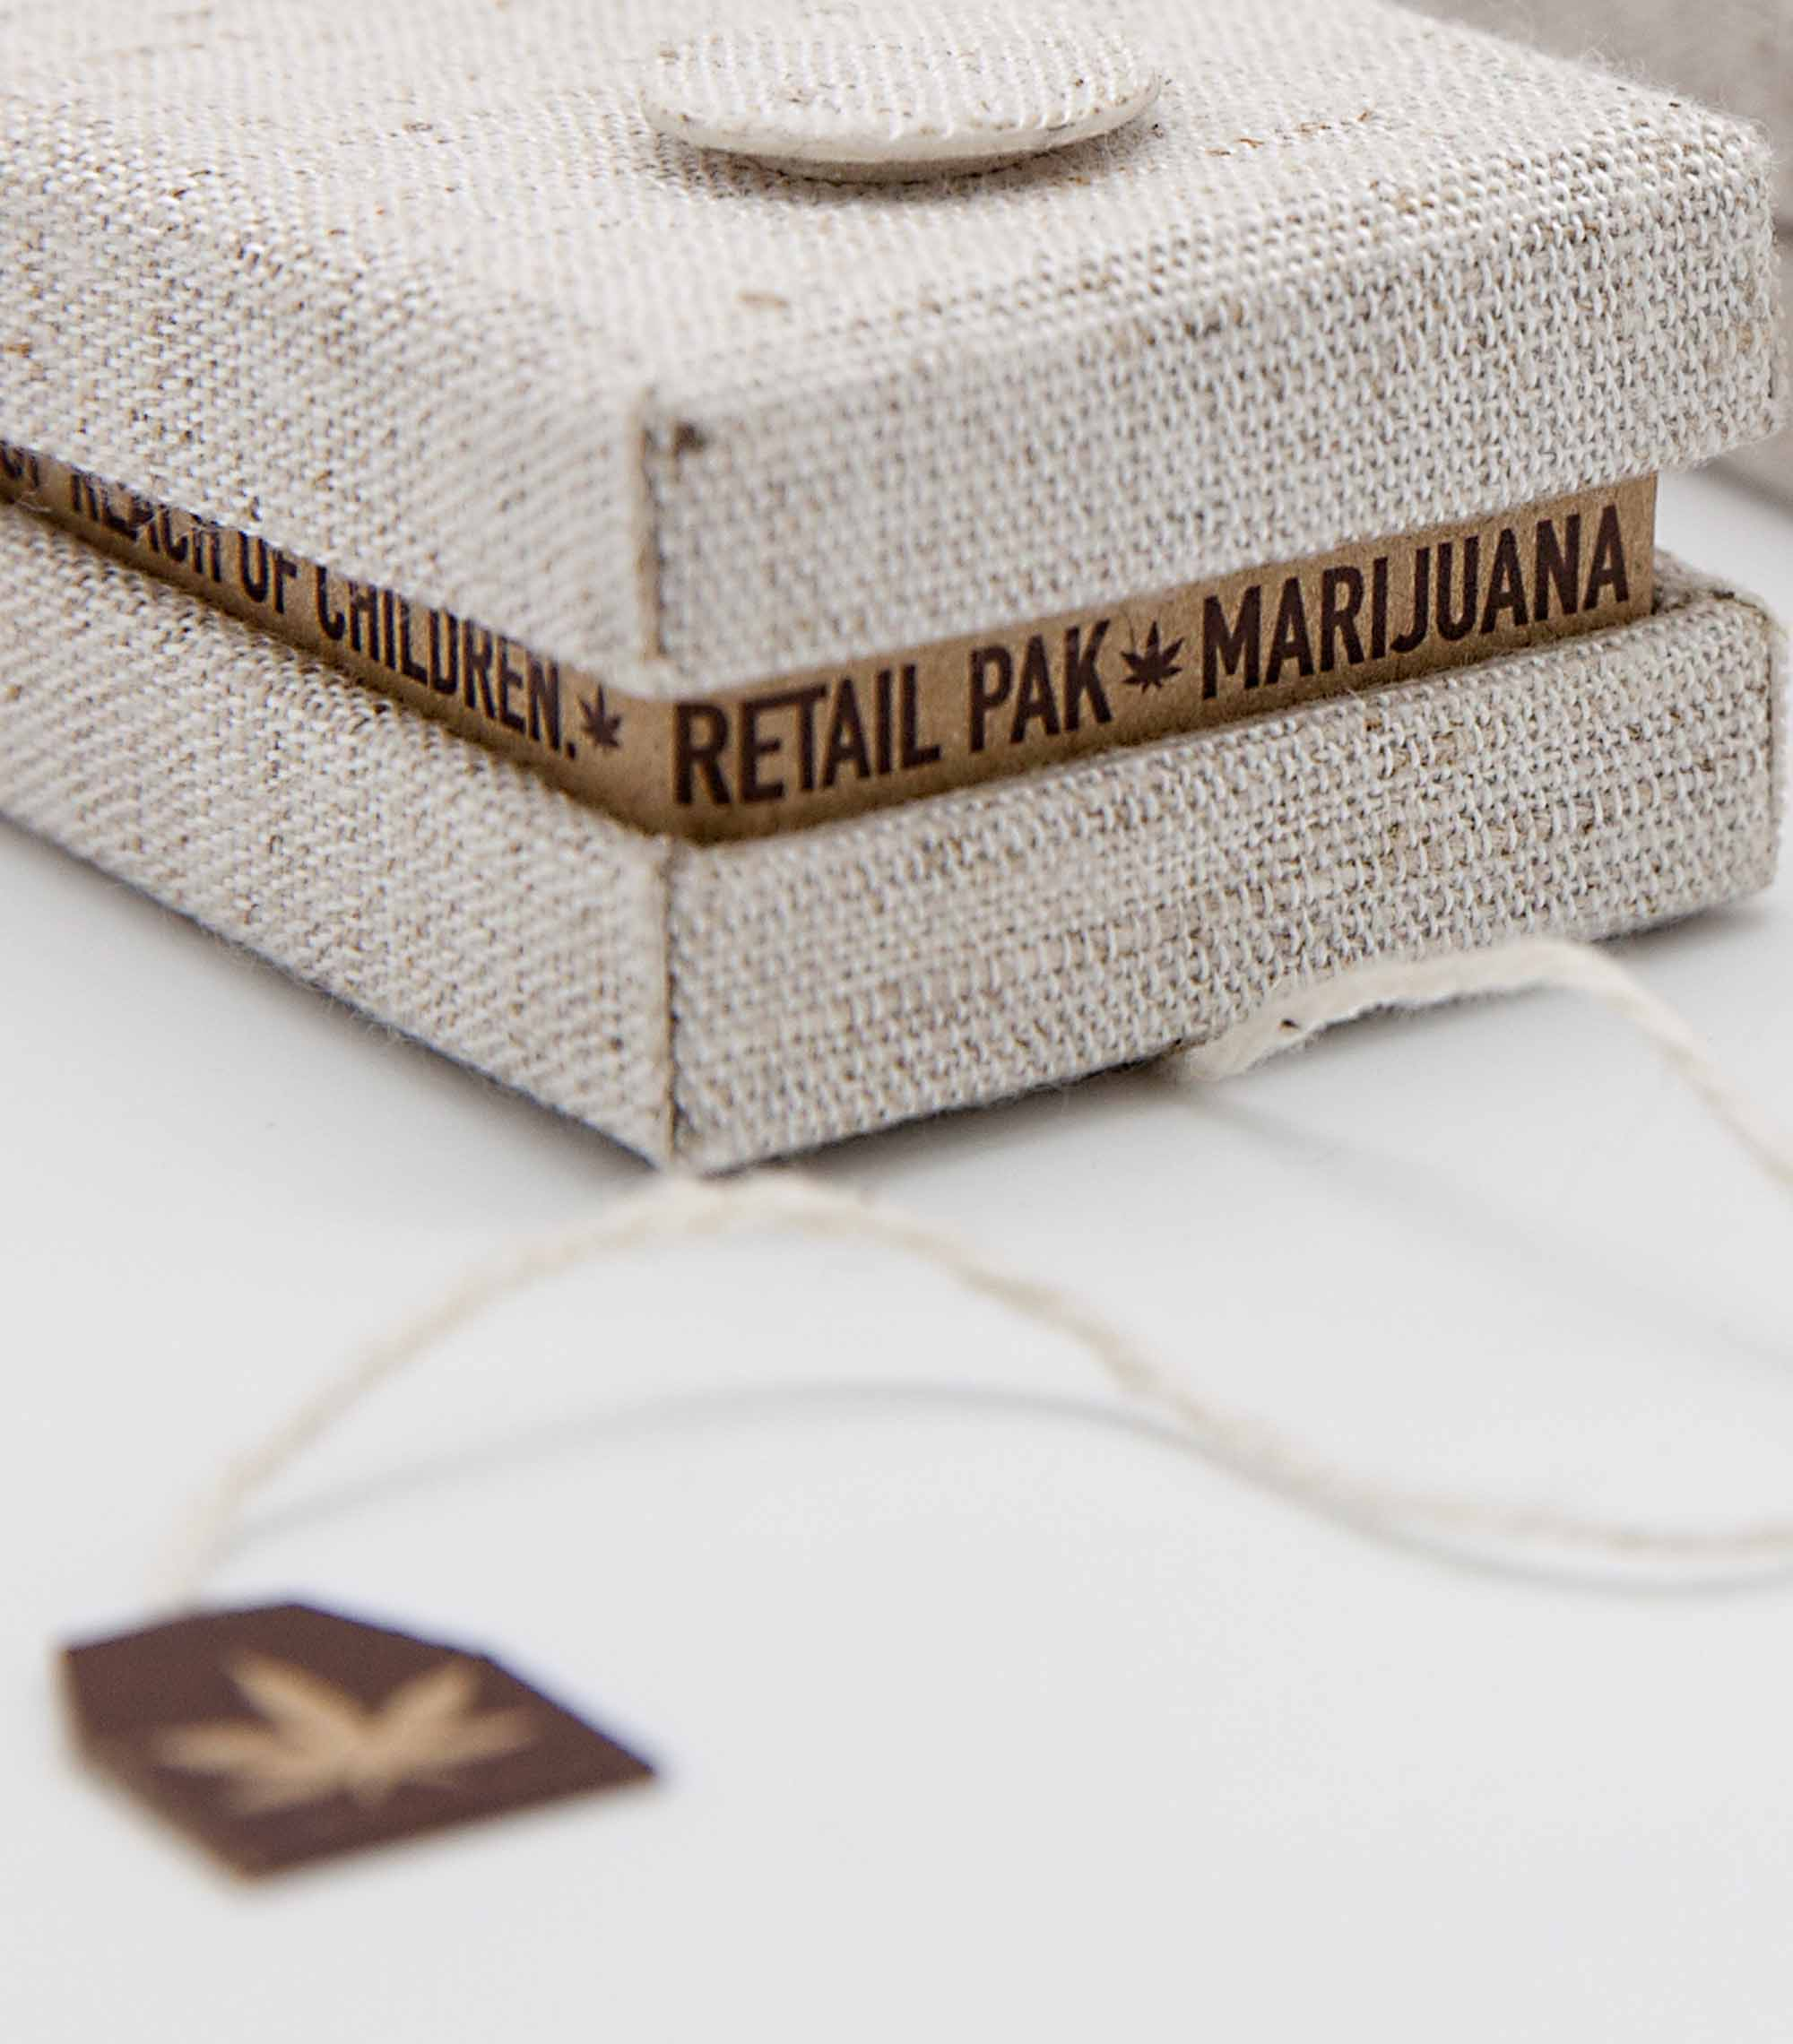 Cannabis Packaging Design & Manufacture